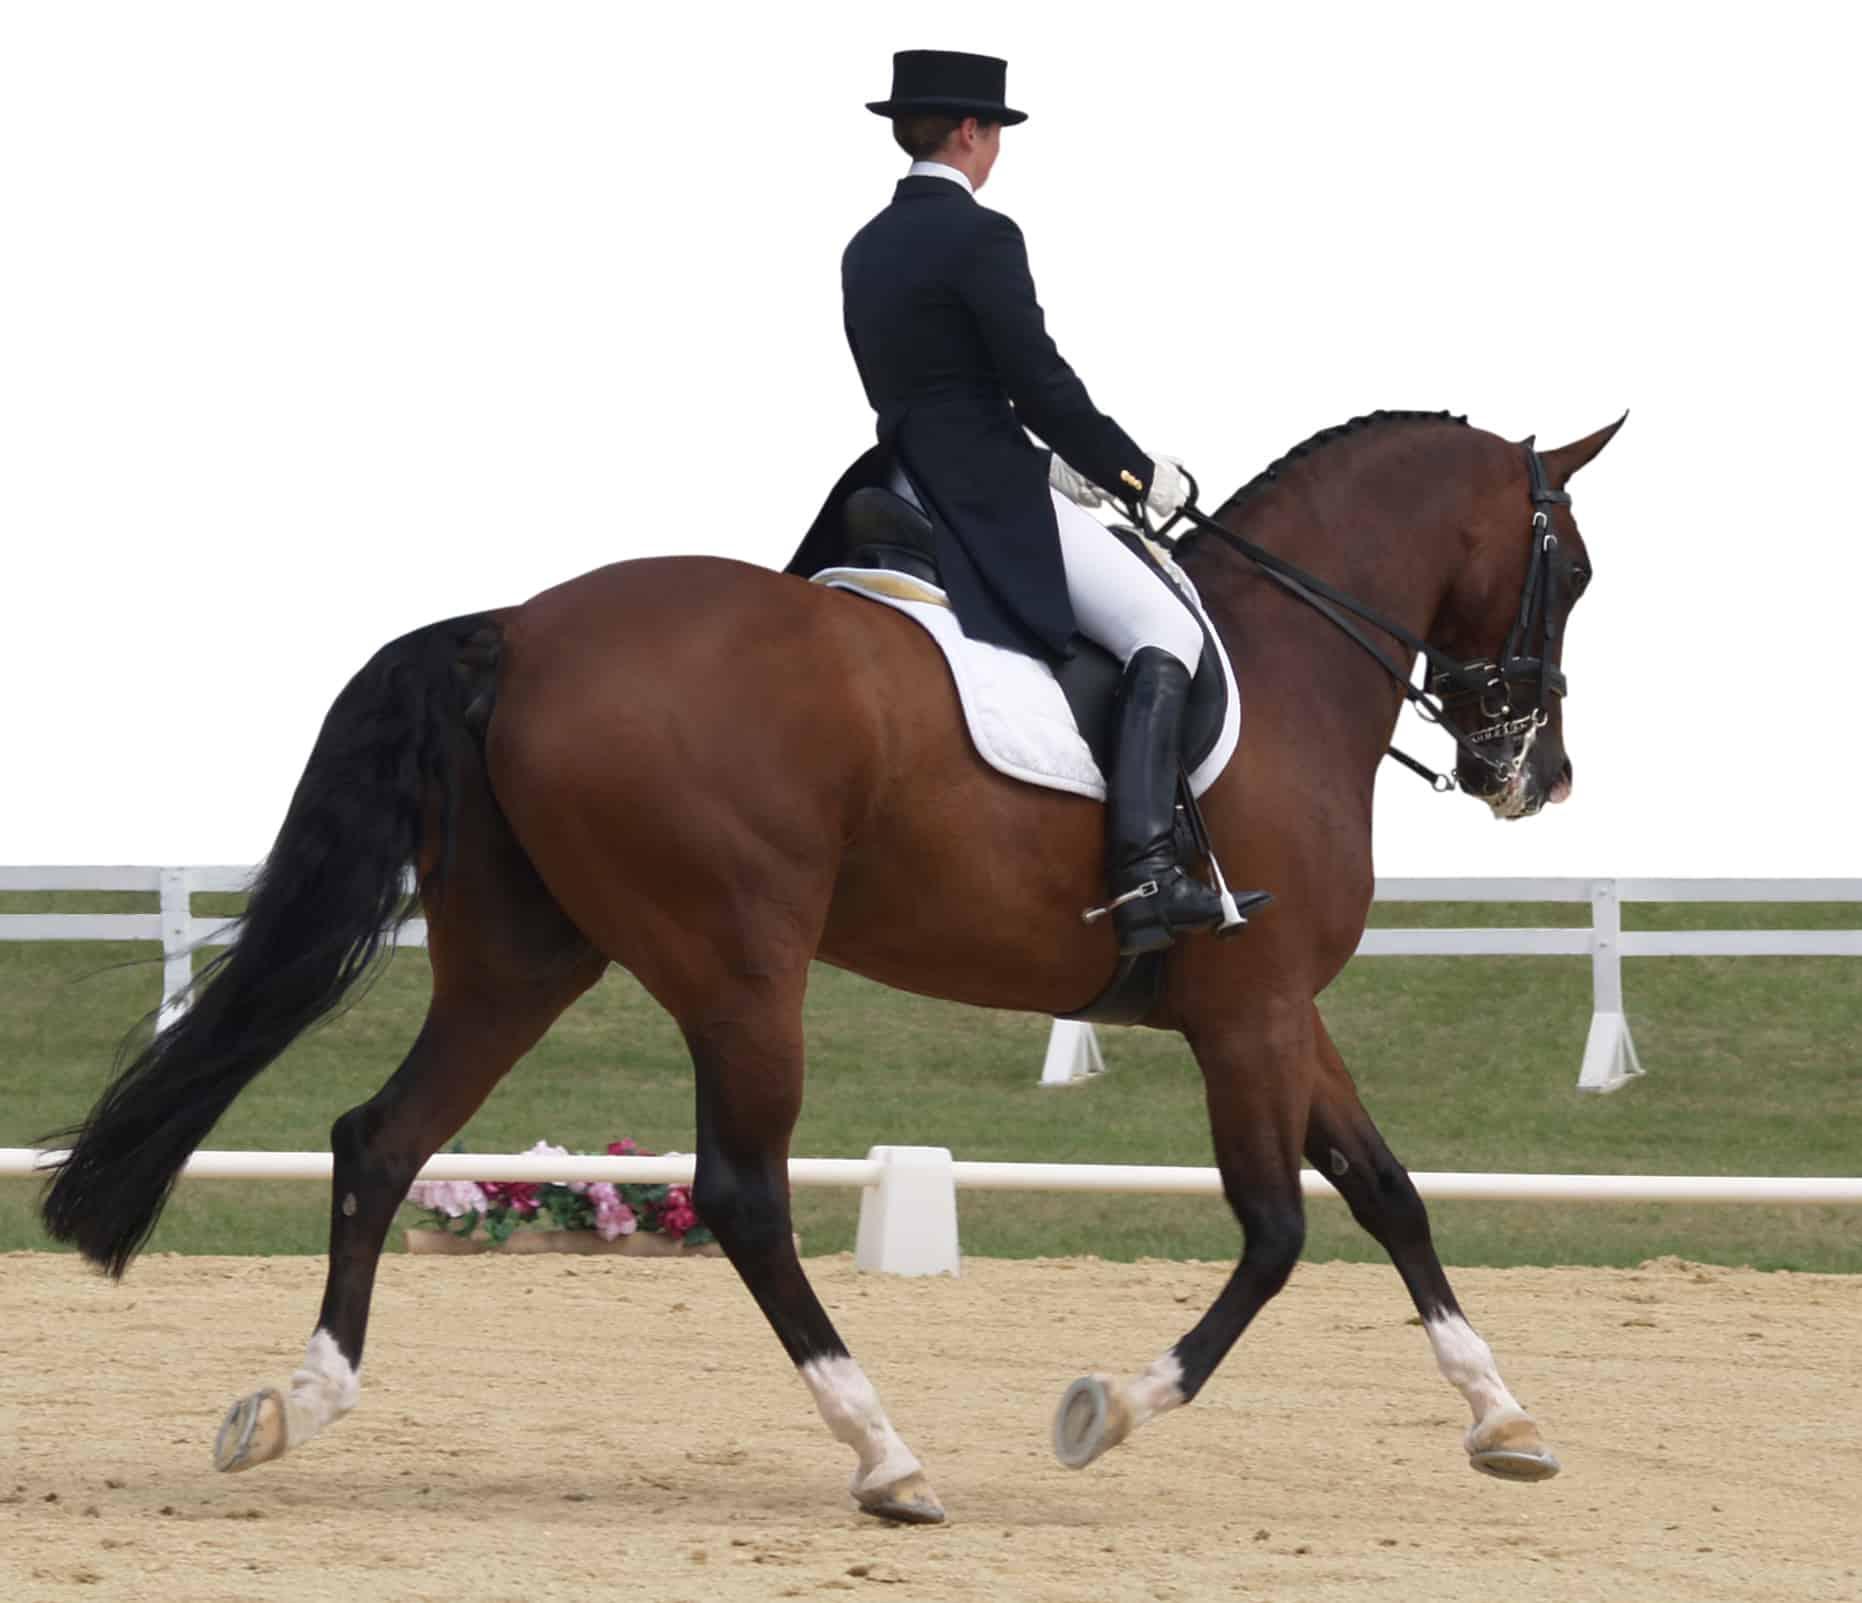 horseback riding styles dressage